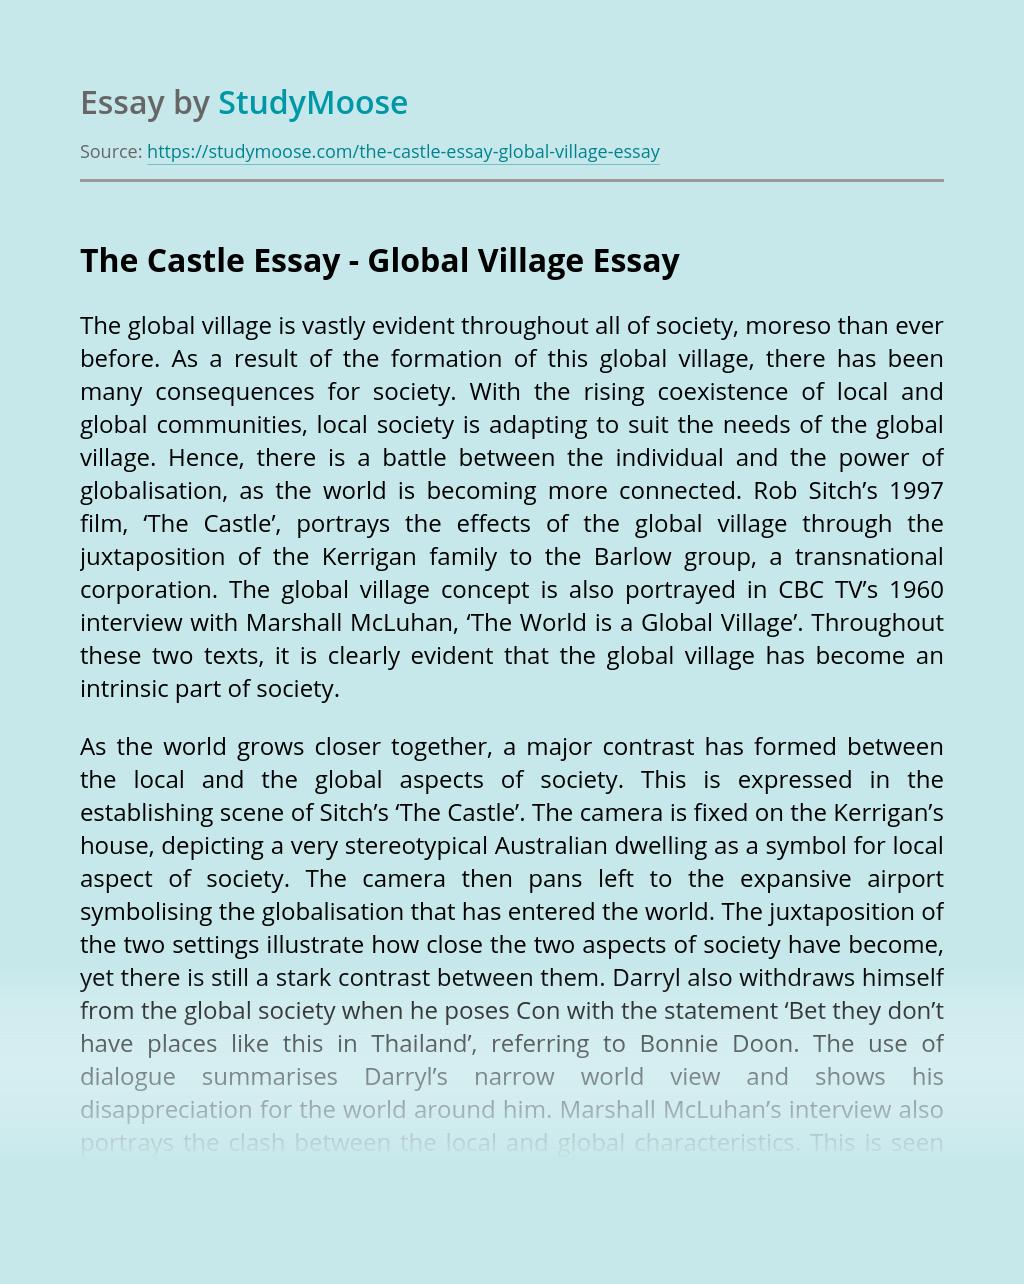 The Castle Essay - Global Village